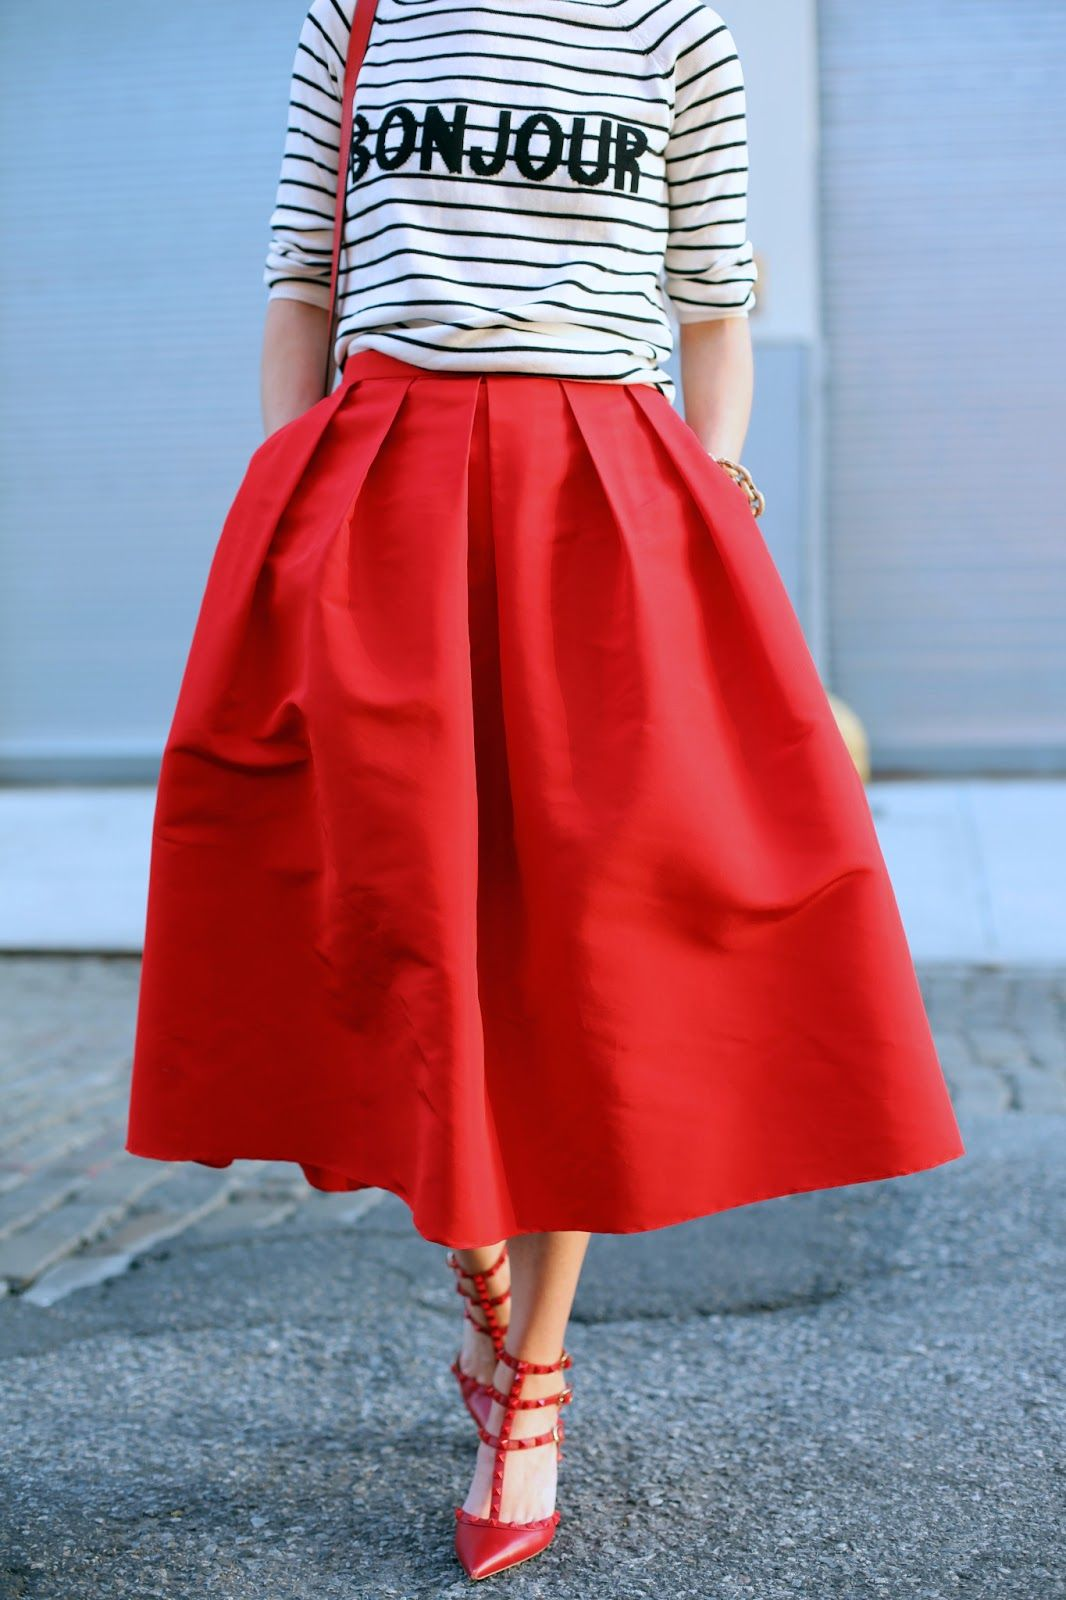 Moda Mujer: Mid-skirt. | Moda Urbana | Pinterest | Breton shirt ...